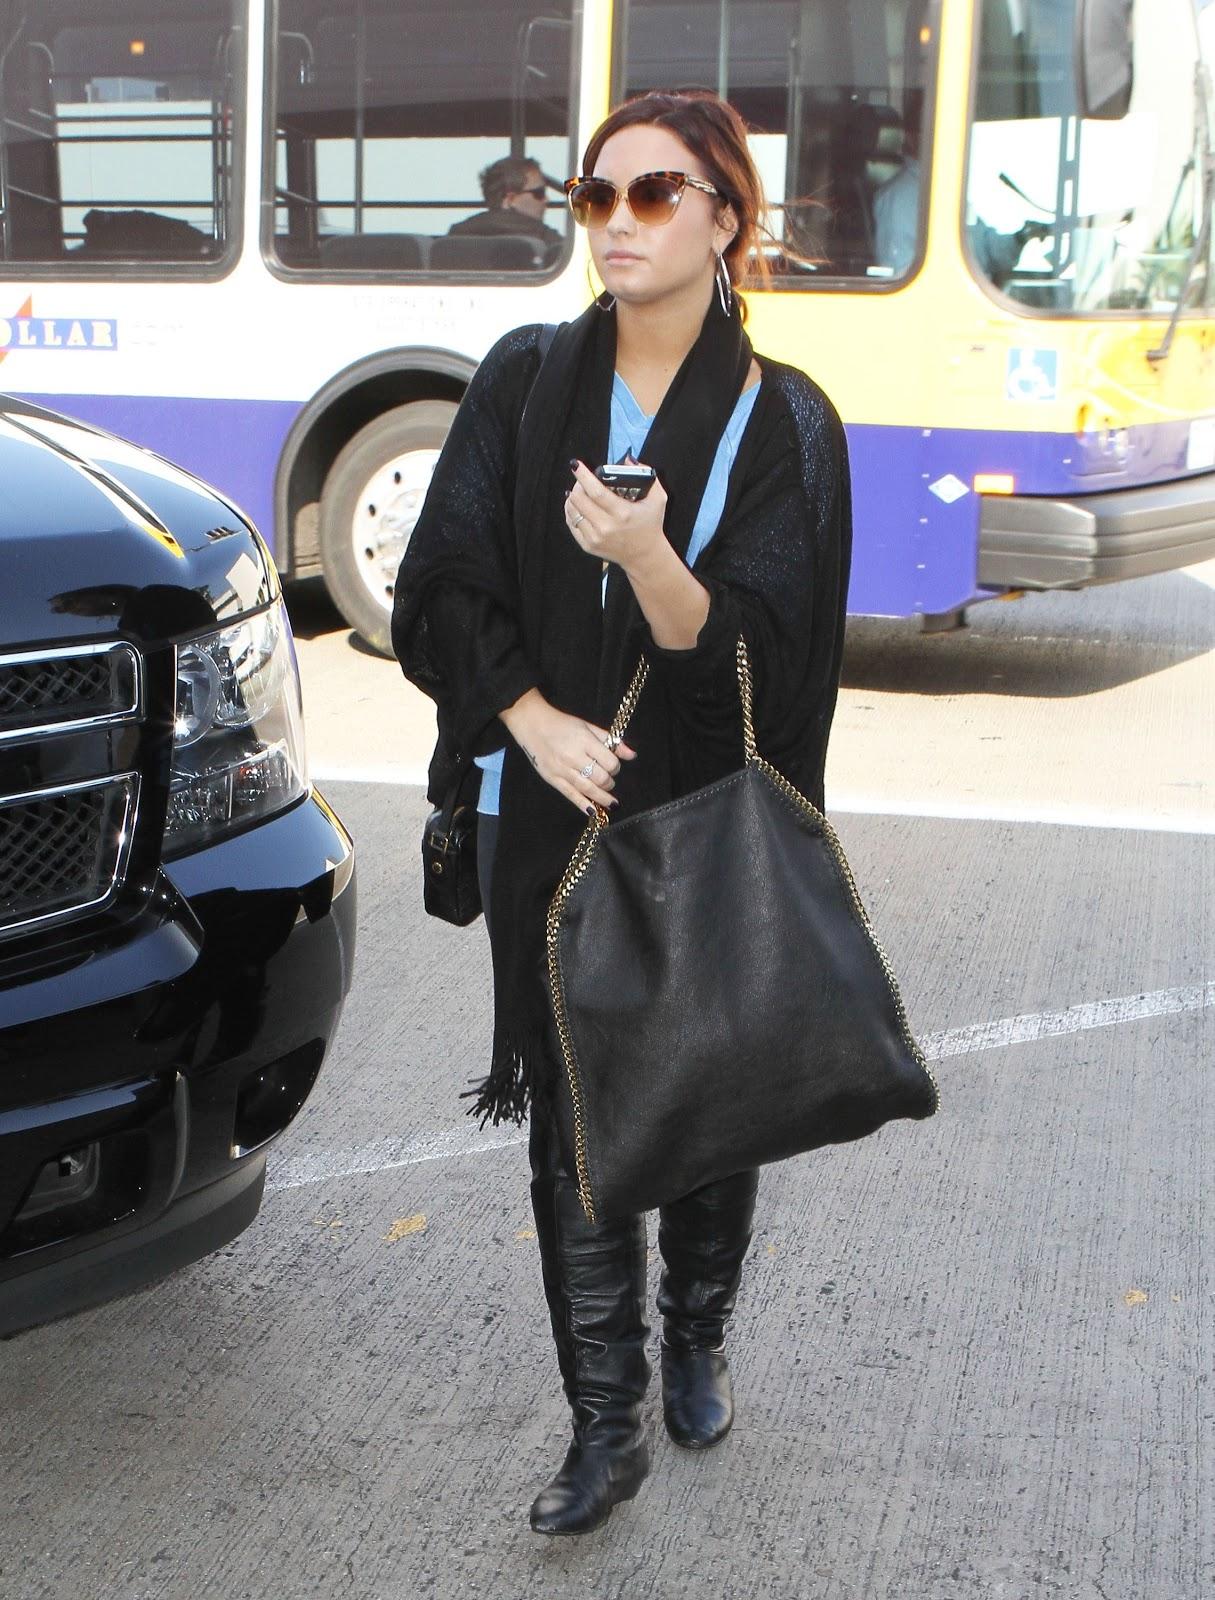 http://1.bp.blogspot.com/-3D9tIILEhIY/TvnN1VbuTAI/AAAAAAAAQSw/EDWXzADnwUw/s1600/CU-Demi+Lovato+arrives+at+LAX-02.JPG